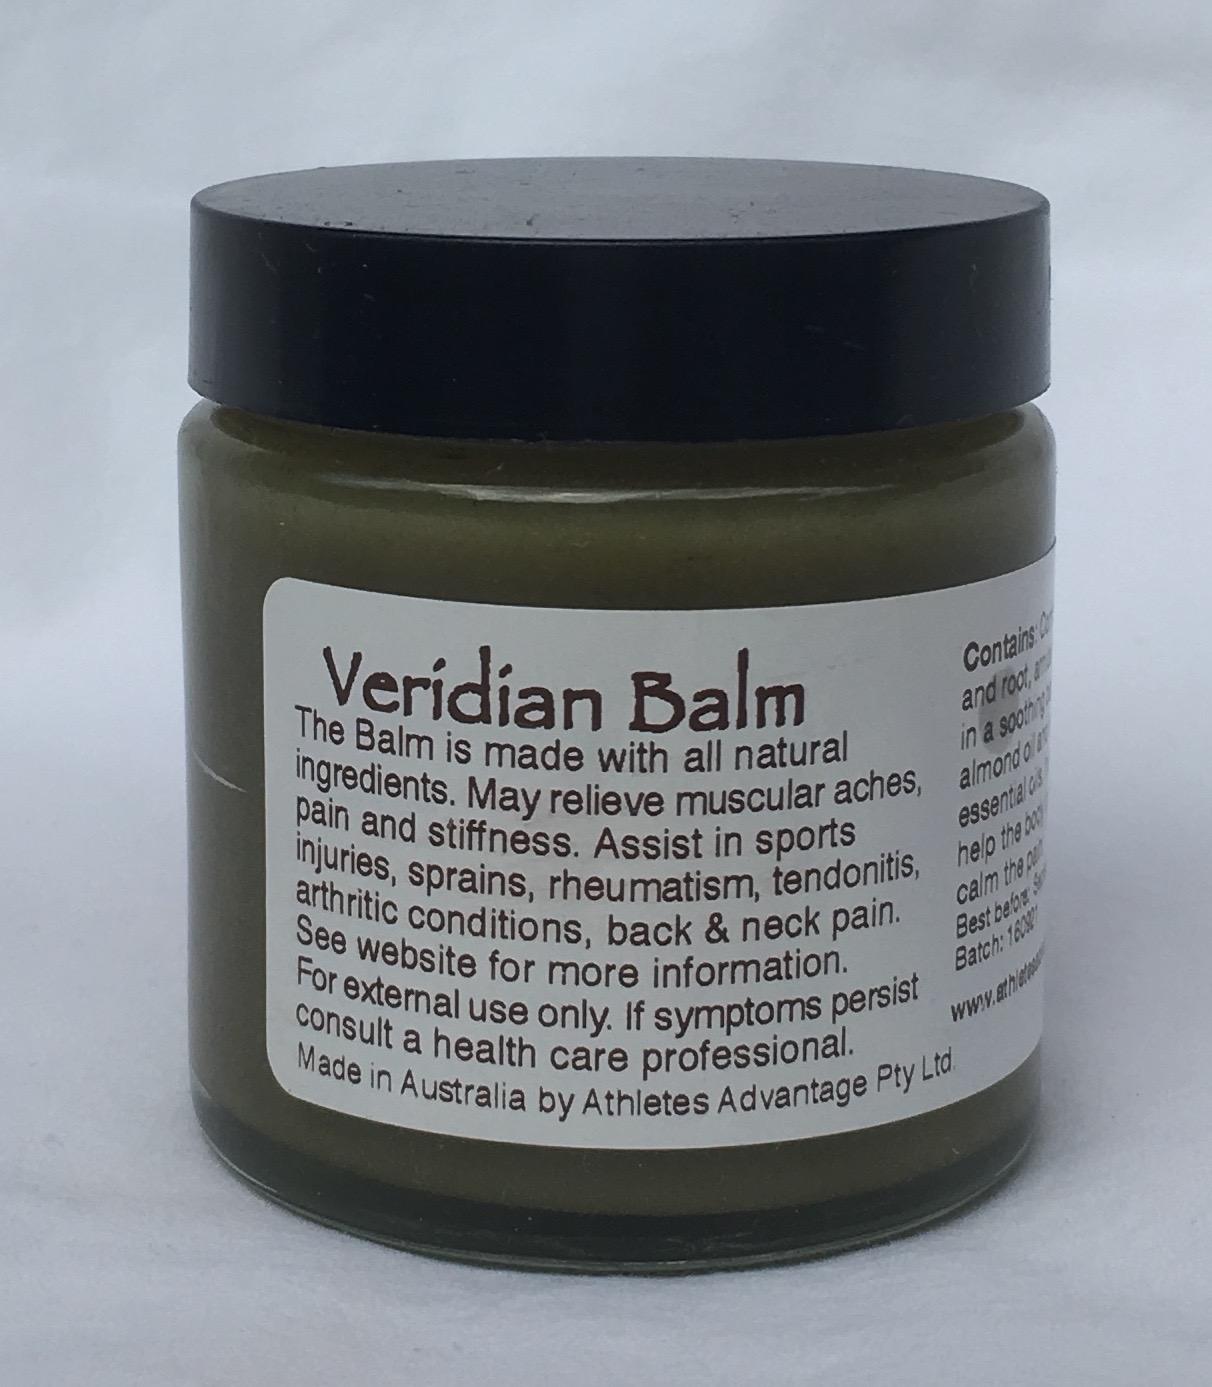 Veridian Balm